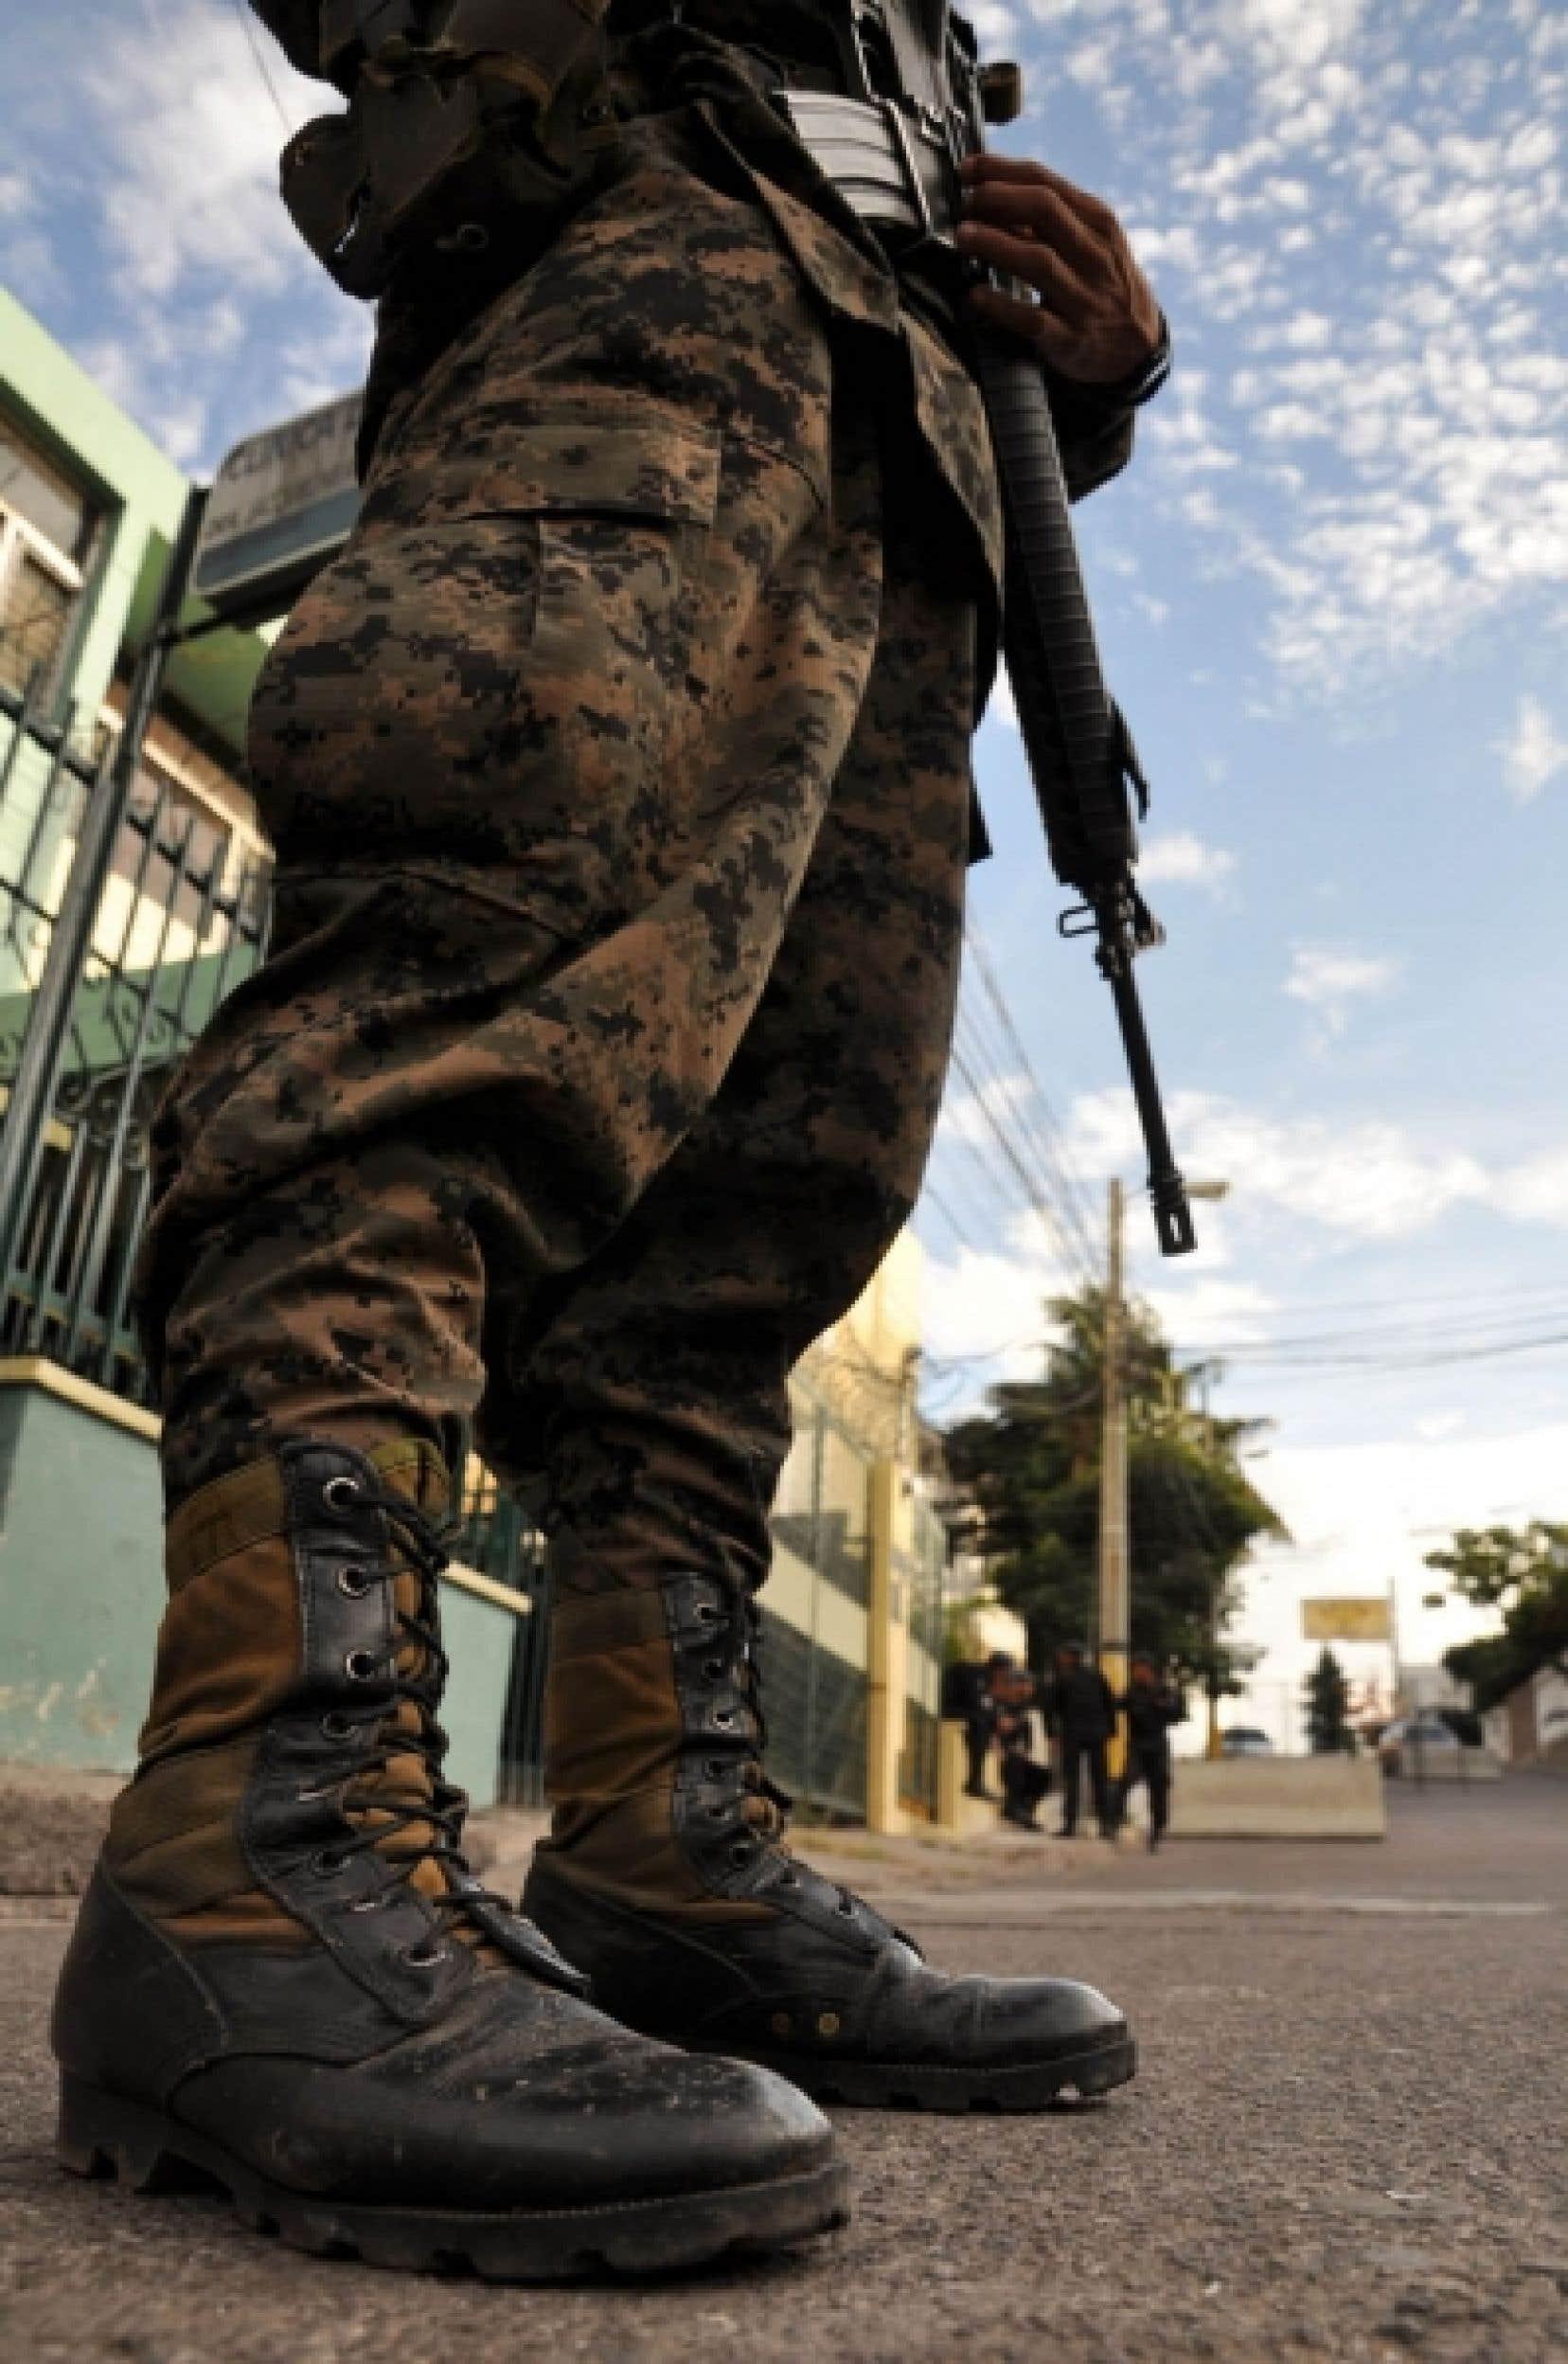 Soldat hondurien dans les rues de Tegucigalpa<br />